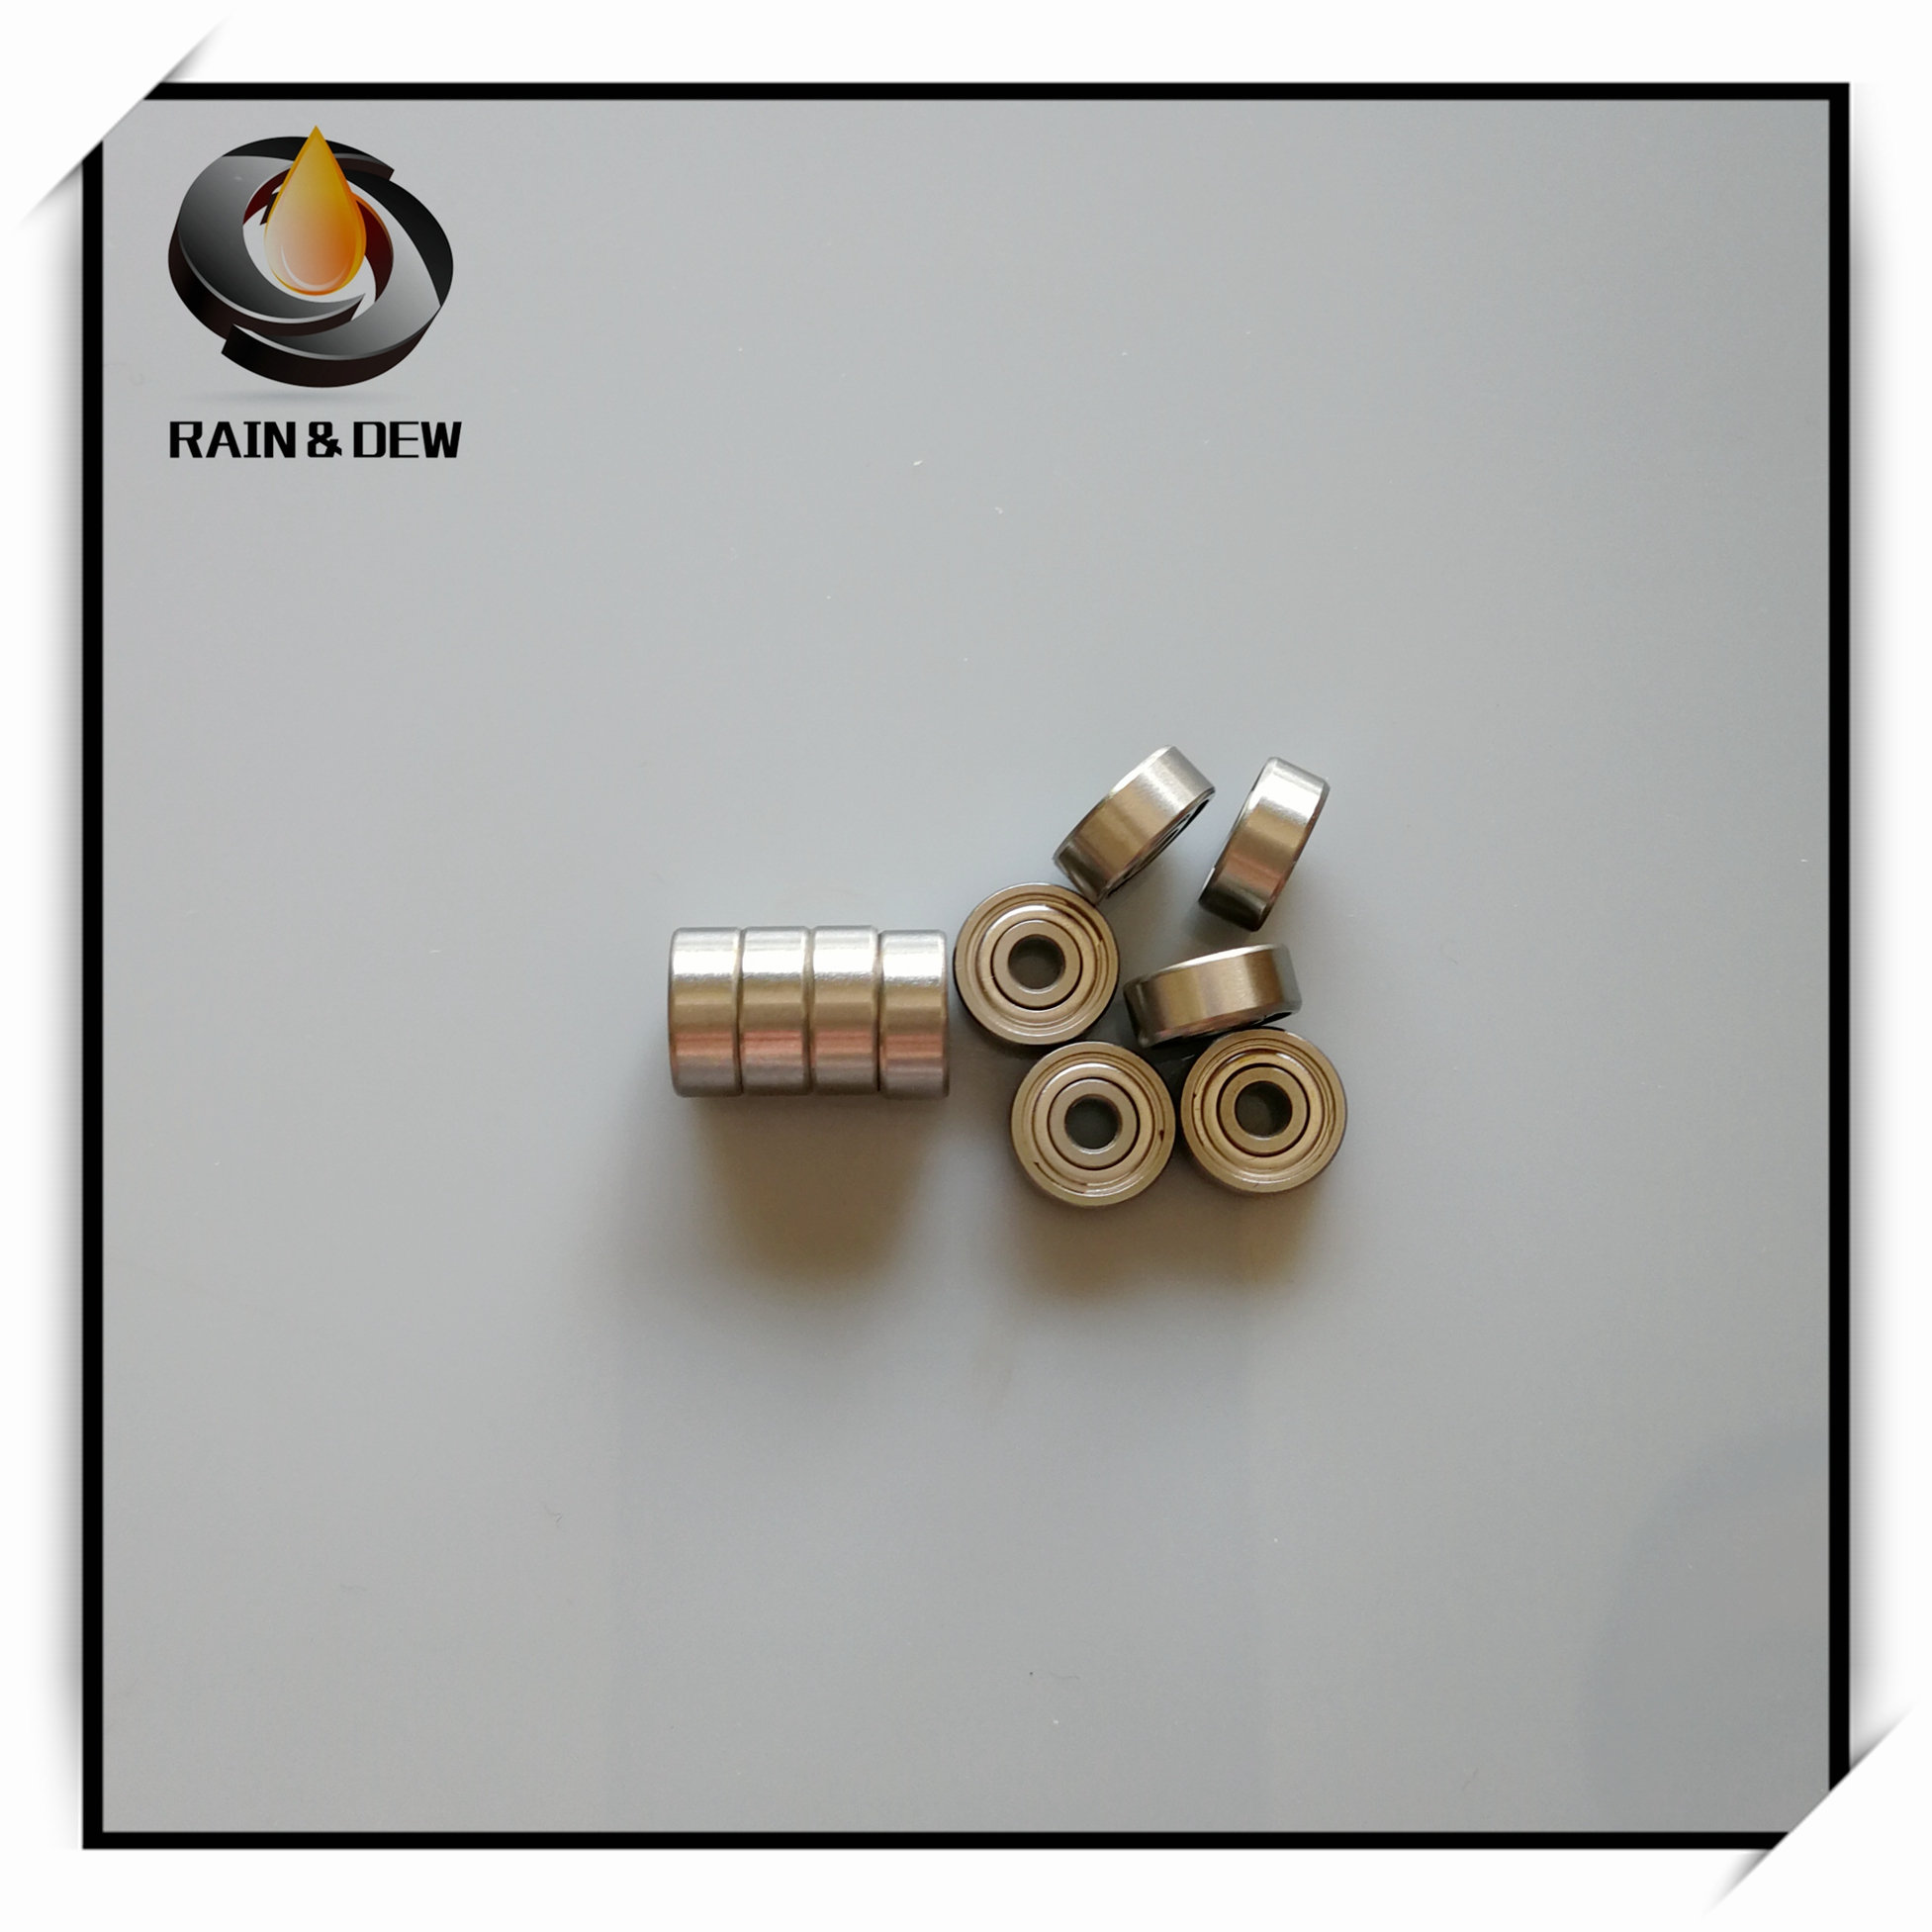 1Pcs  SMR104ZZ CB 4x10x4 Mm ABEC7 MR104  Stainless Steel Hybrid Ceramic Ball Bearing  RC Car Bearing